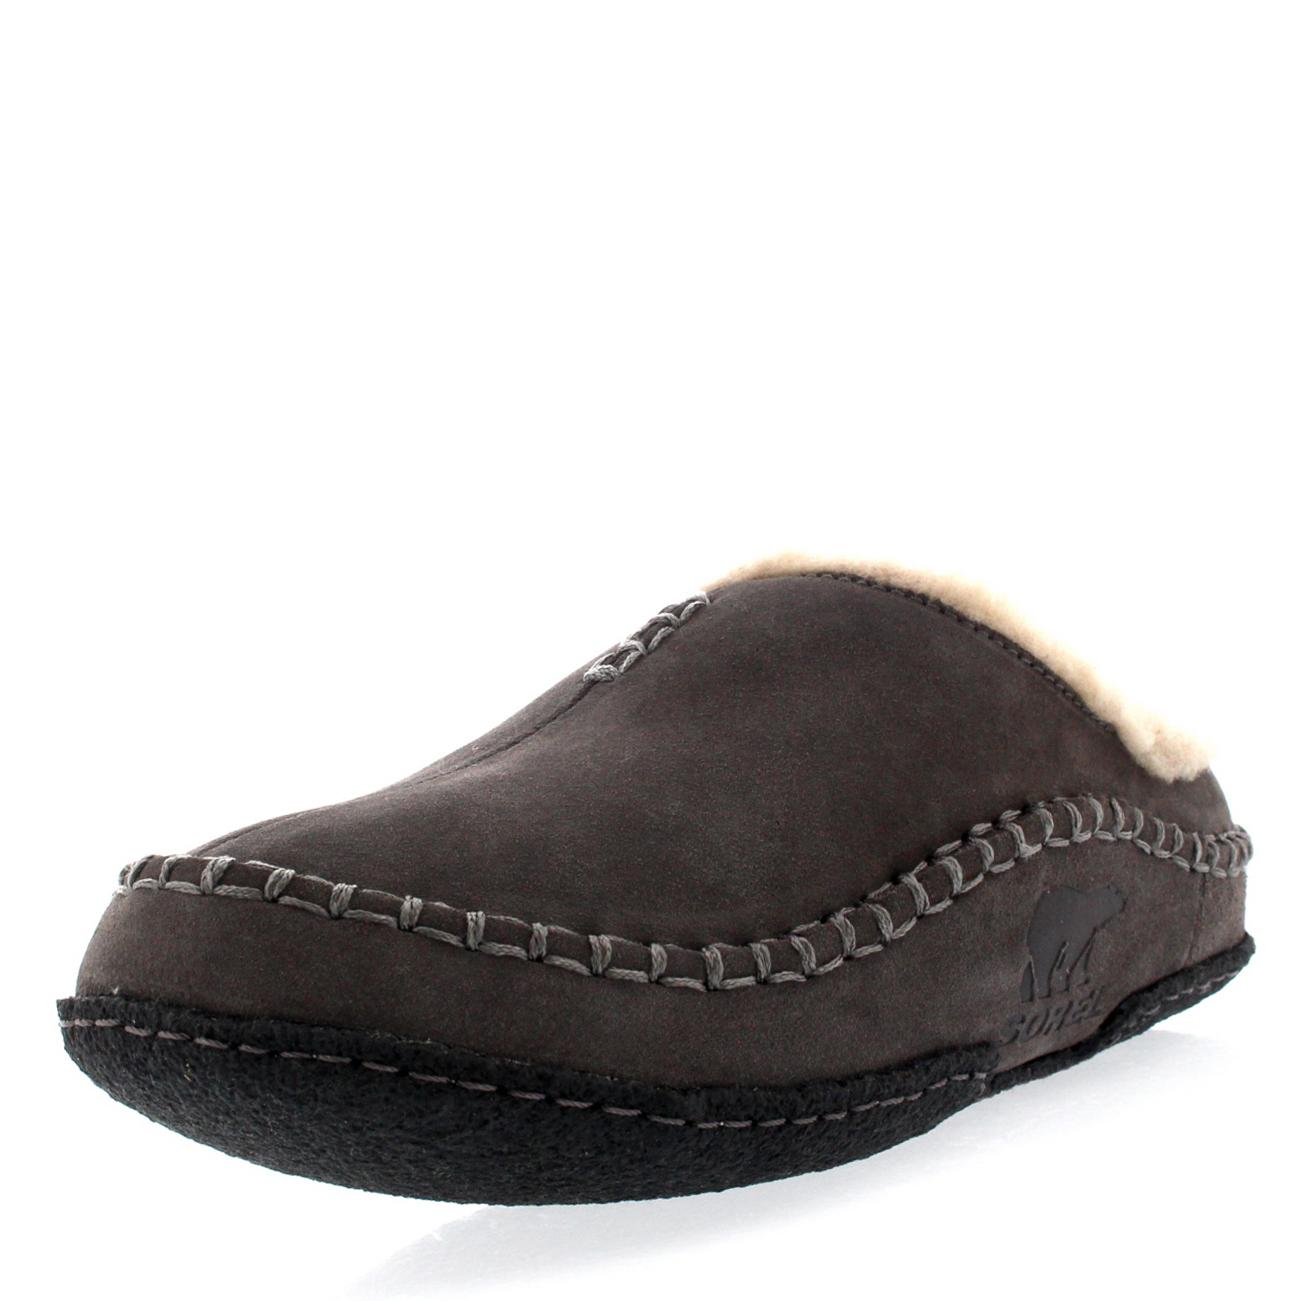 Mens Sorel Falcon Ridge Slip On Fur Lined Winter Warm Mules Slippers Uk 7 12 Ebay